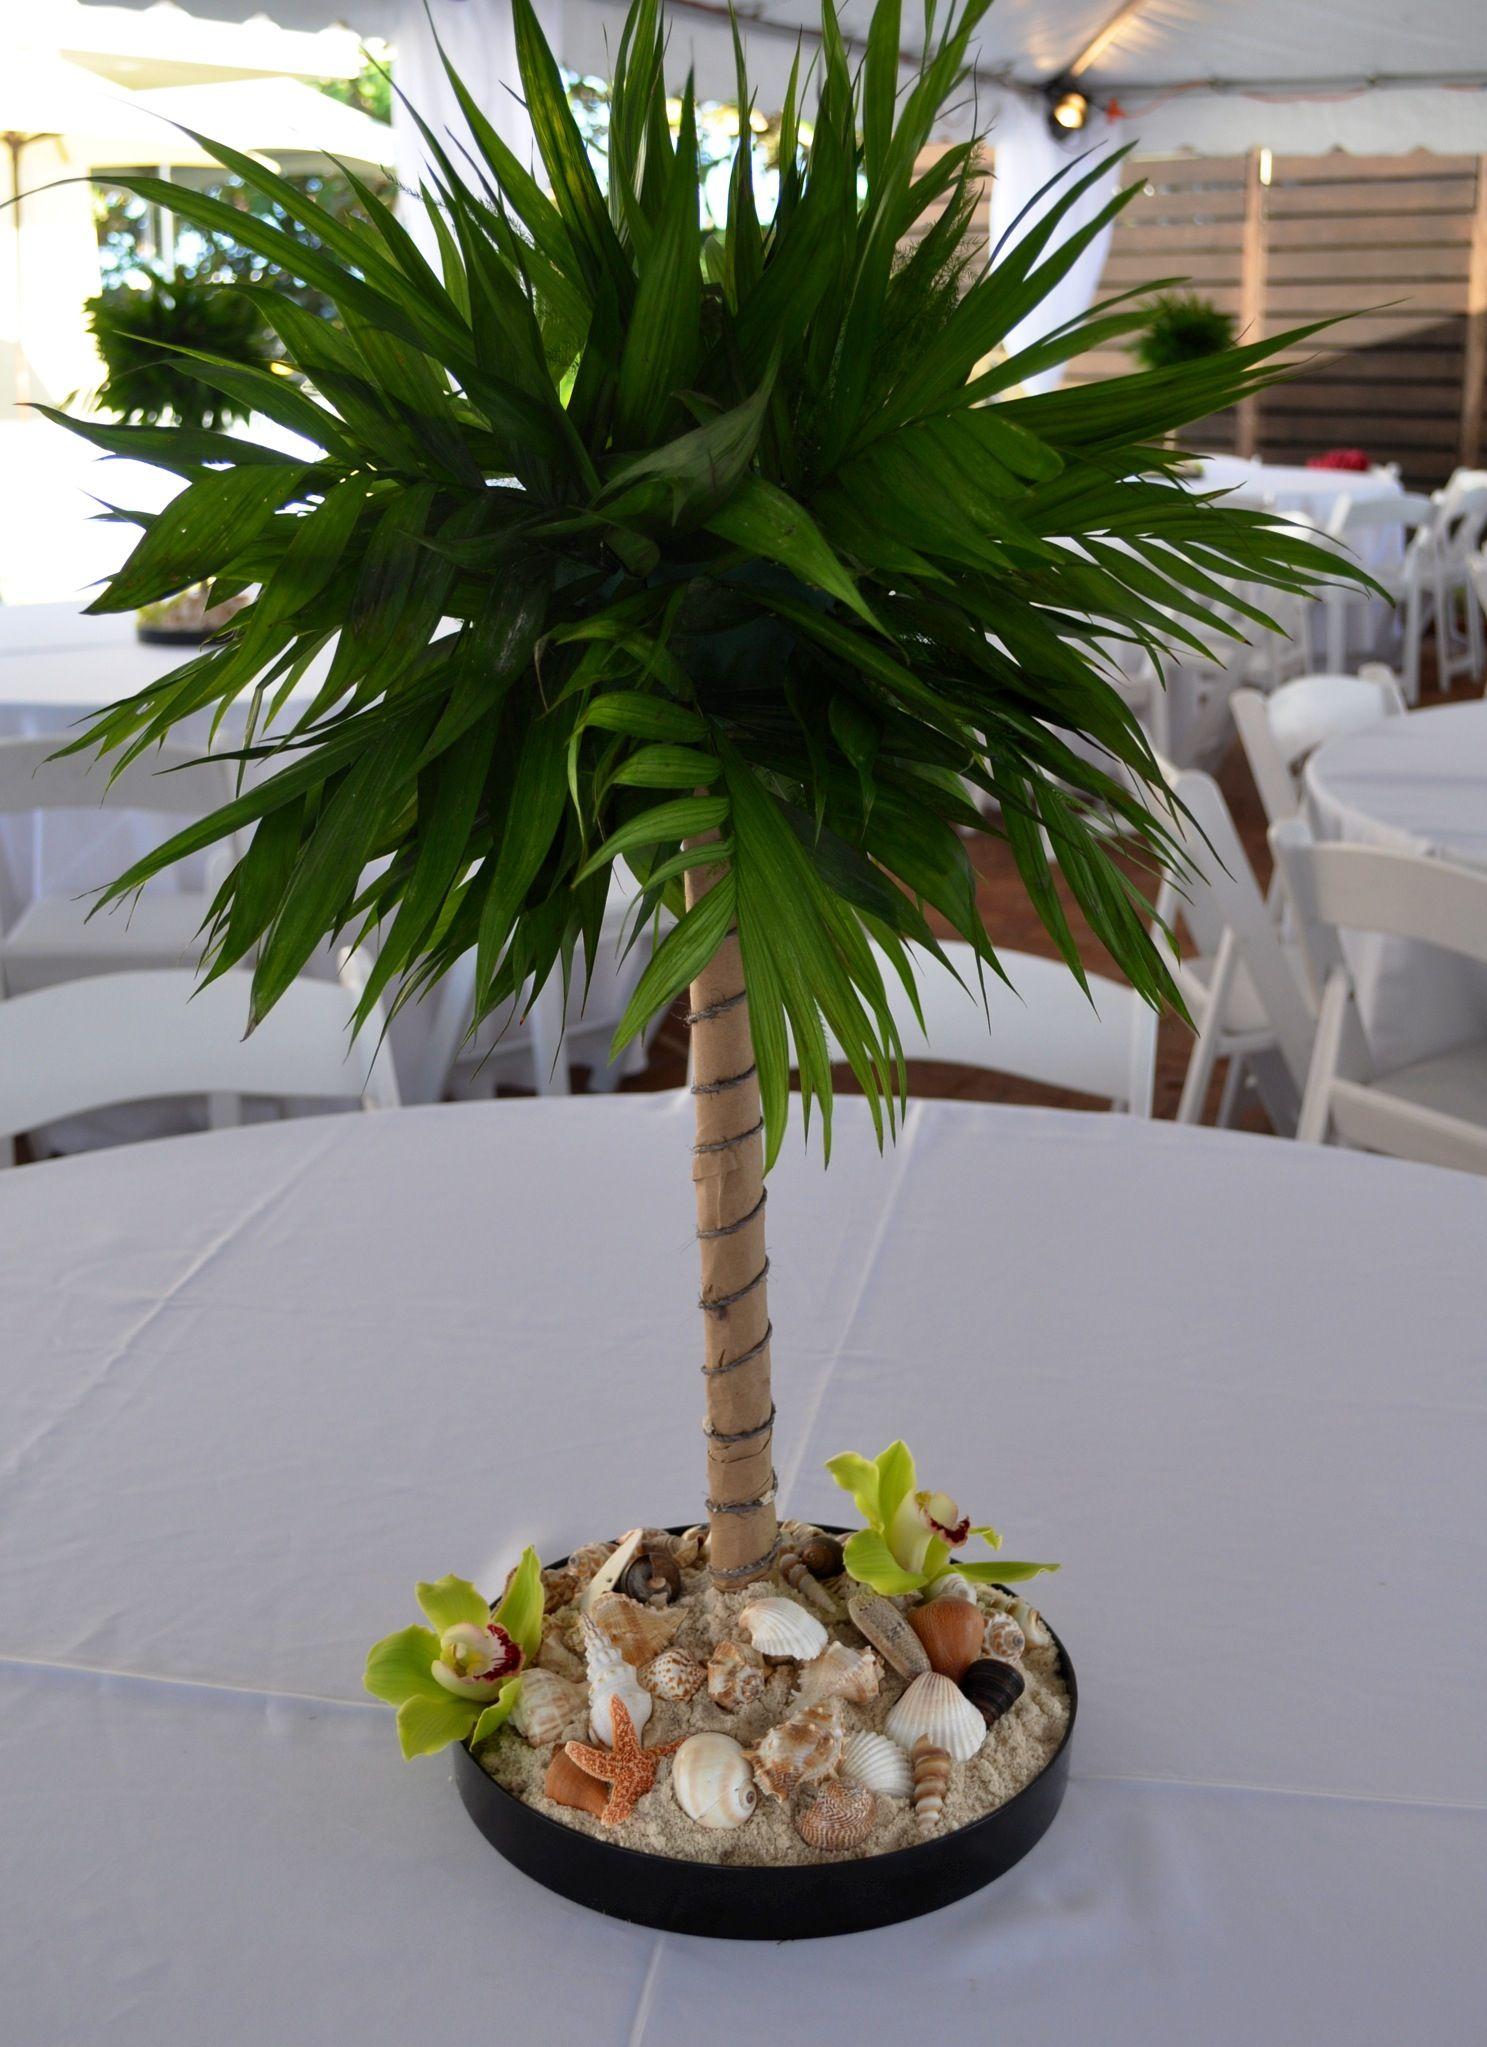 miniature palm tree centerpiece for beach theme party flowers rh pinterest com palm tree centerpieces weddings palm tree centerpieces for baby shower